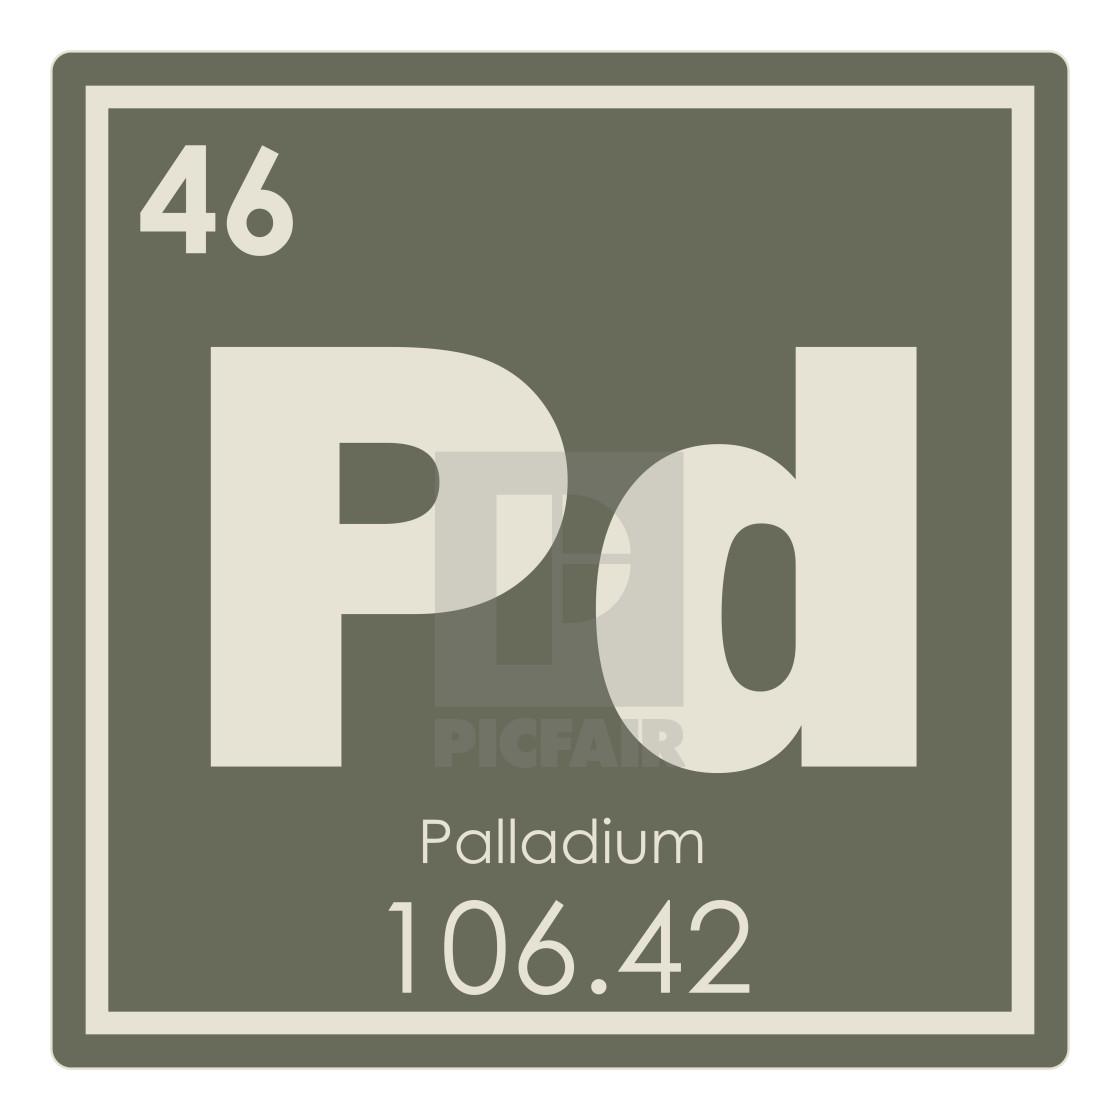 Palladium Chemical Element License For 744 On Picfair